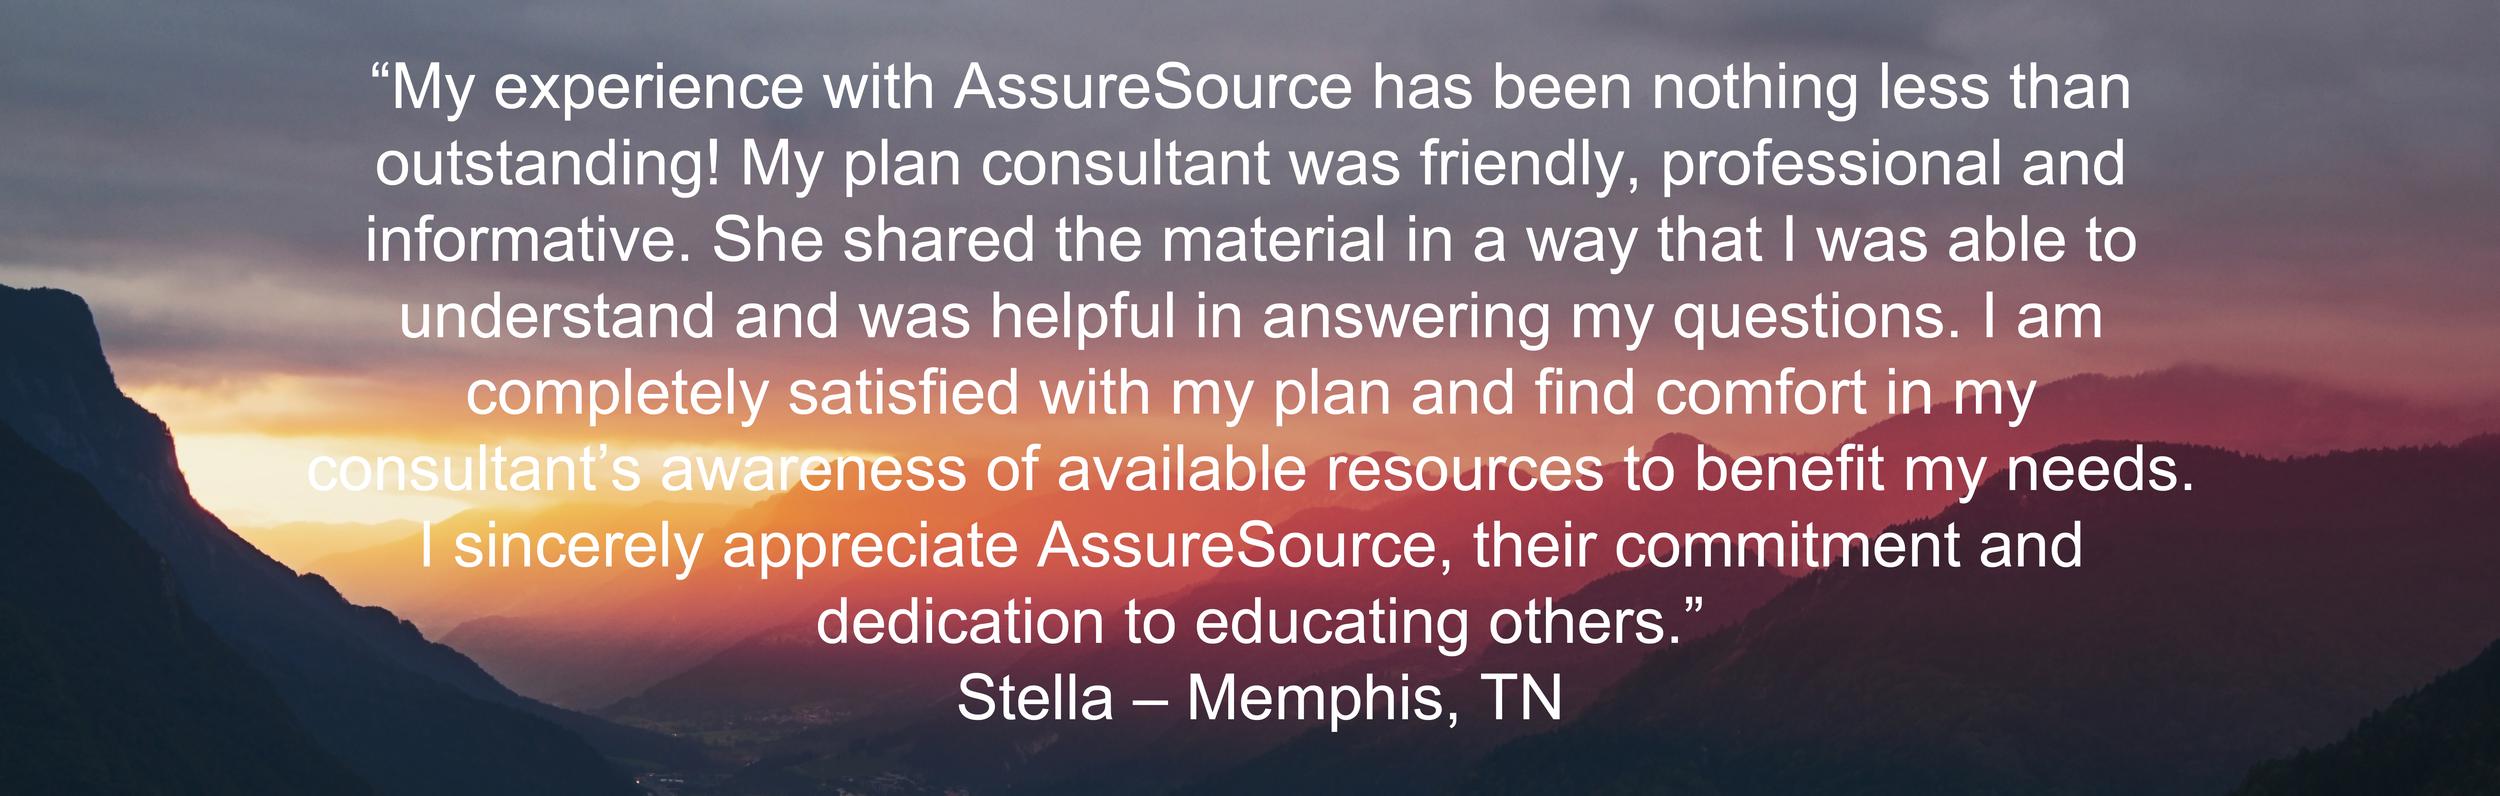 Stella – Memphis, TN.png